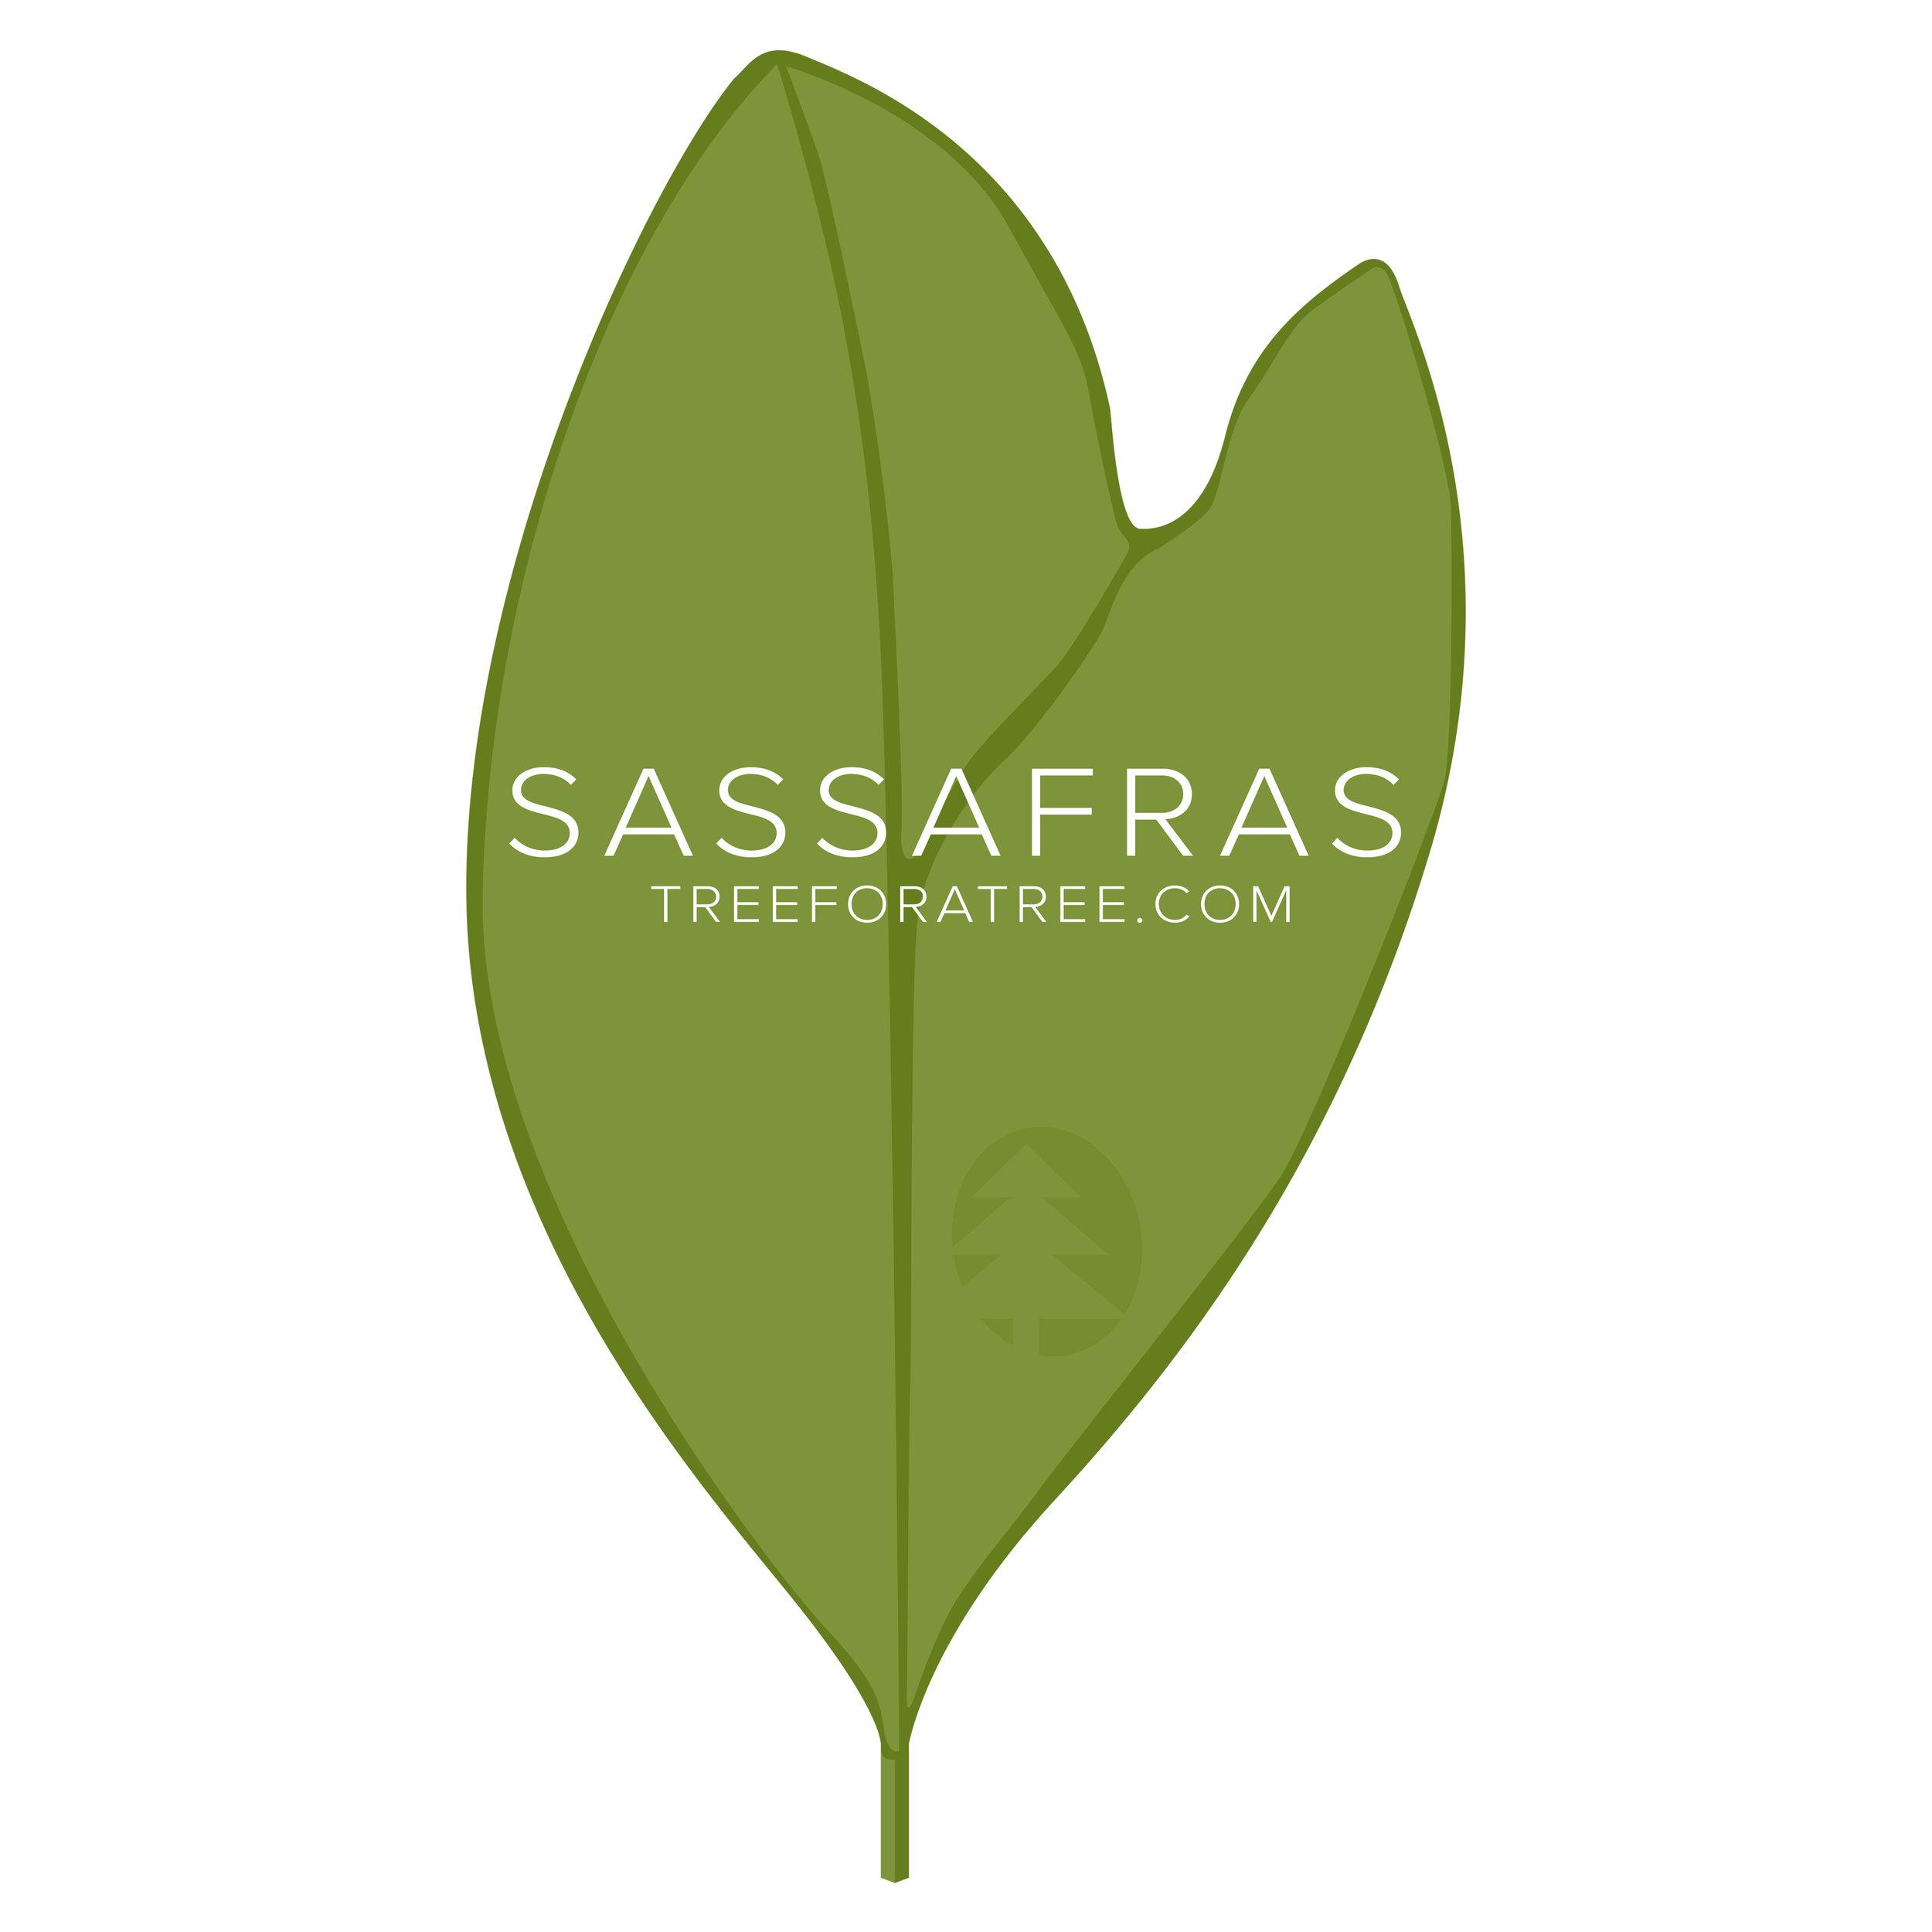 Sassafras - Latin Name: Sassafras albidumGrowth Rate: Very FastMature Height: ≈50 ftMature Spread: ≈30 ftState Champ: Portage Co. (57' high x 61' spread)